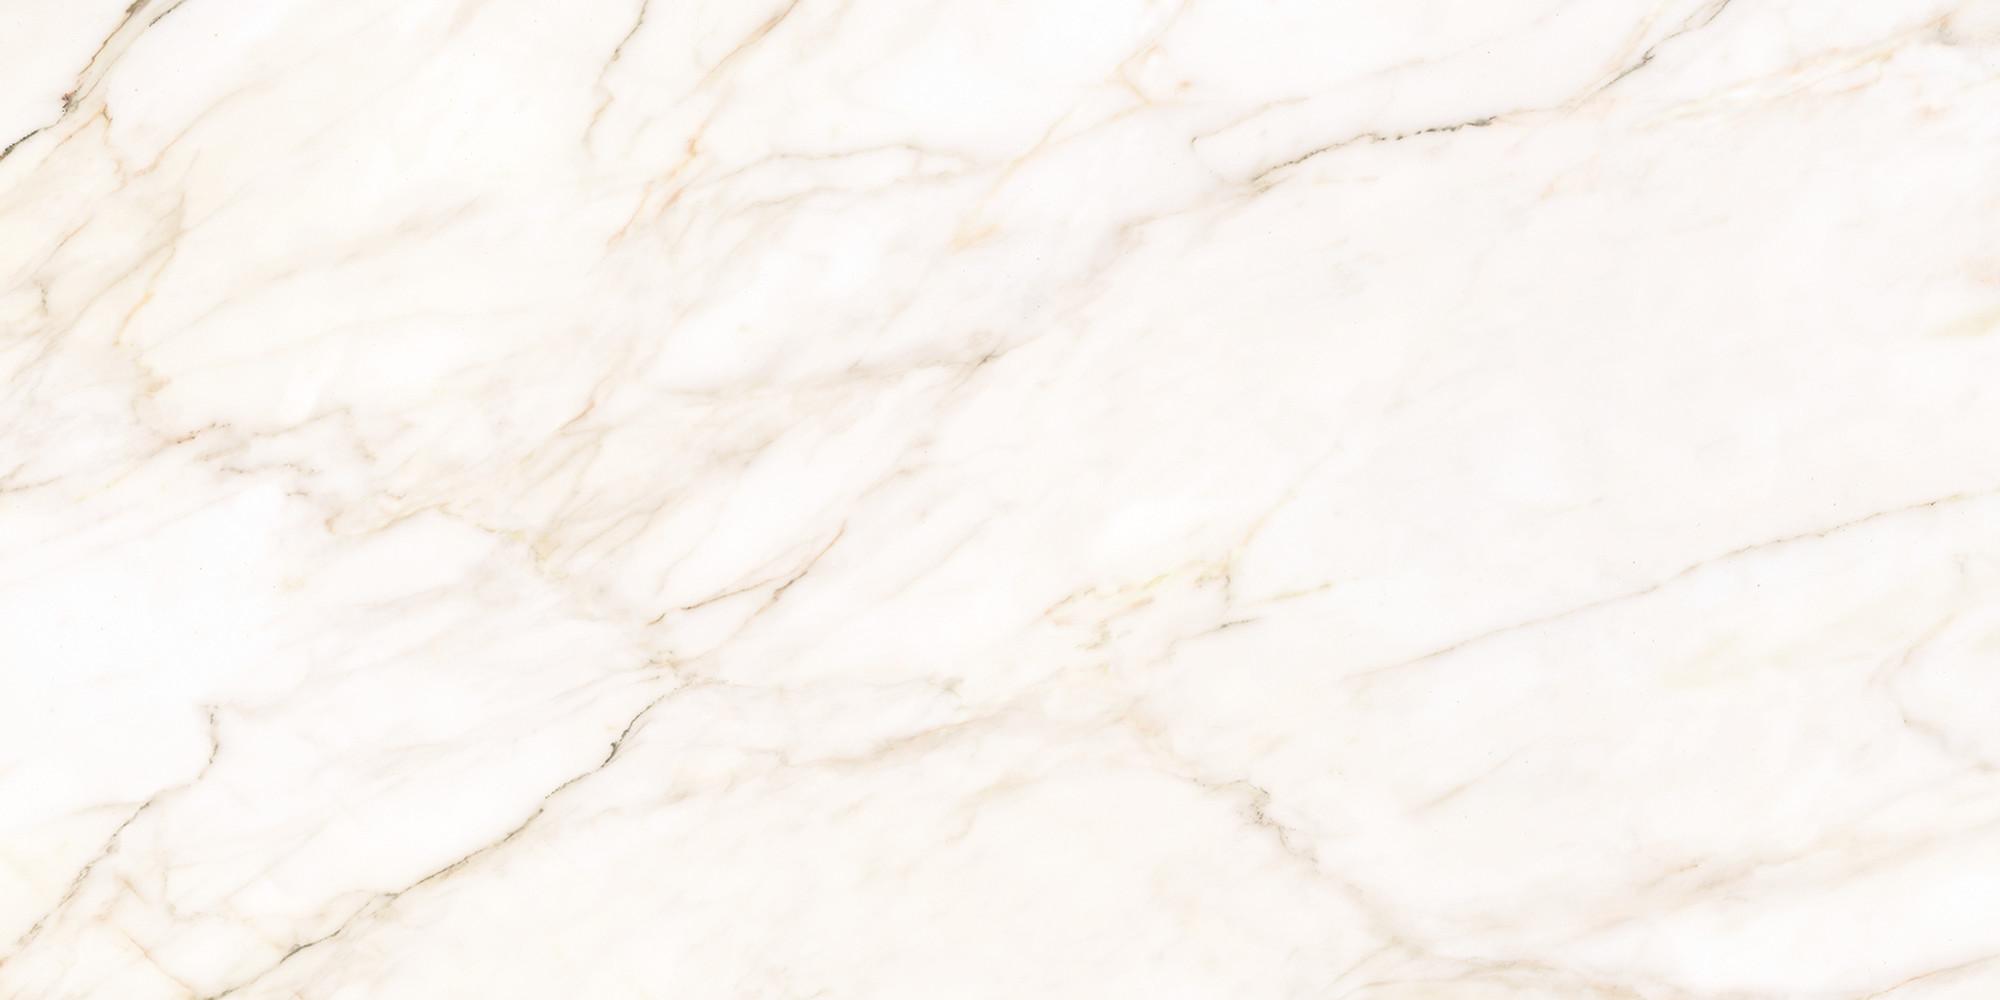 Peronda Gioia Gold 60x120 płytki imitujące marmur